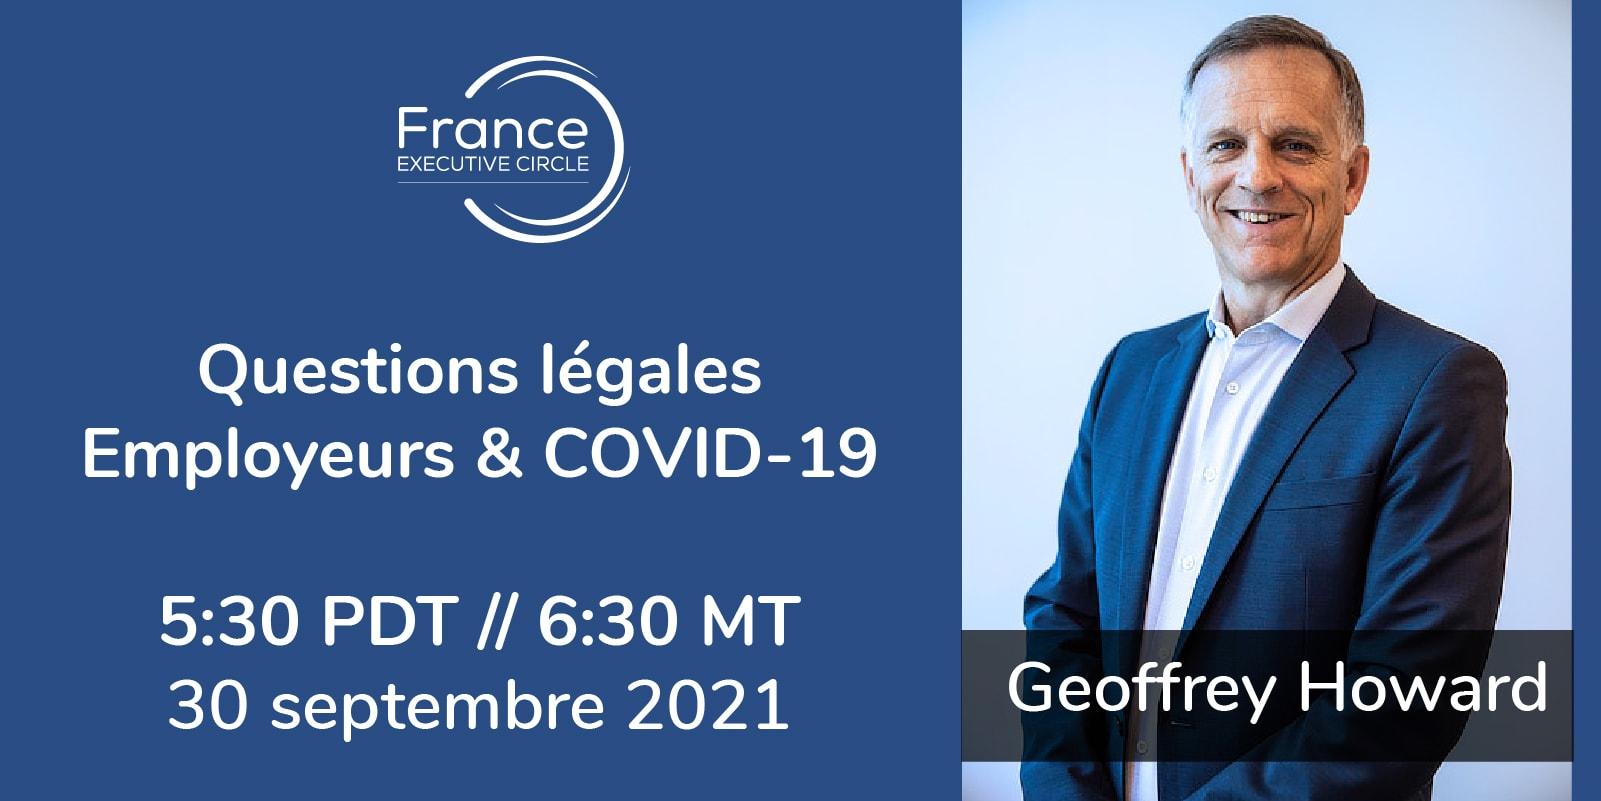 Questions légales Employeurs & COVID-19